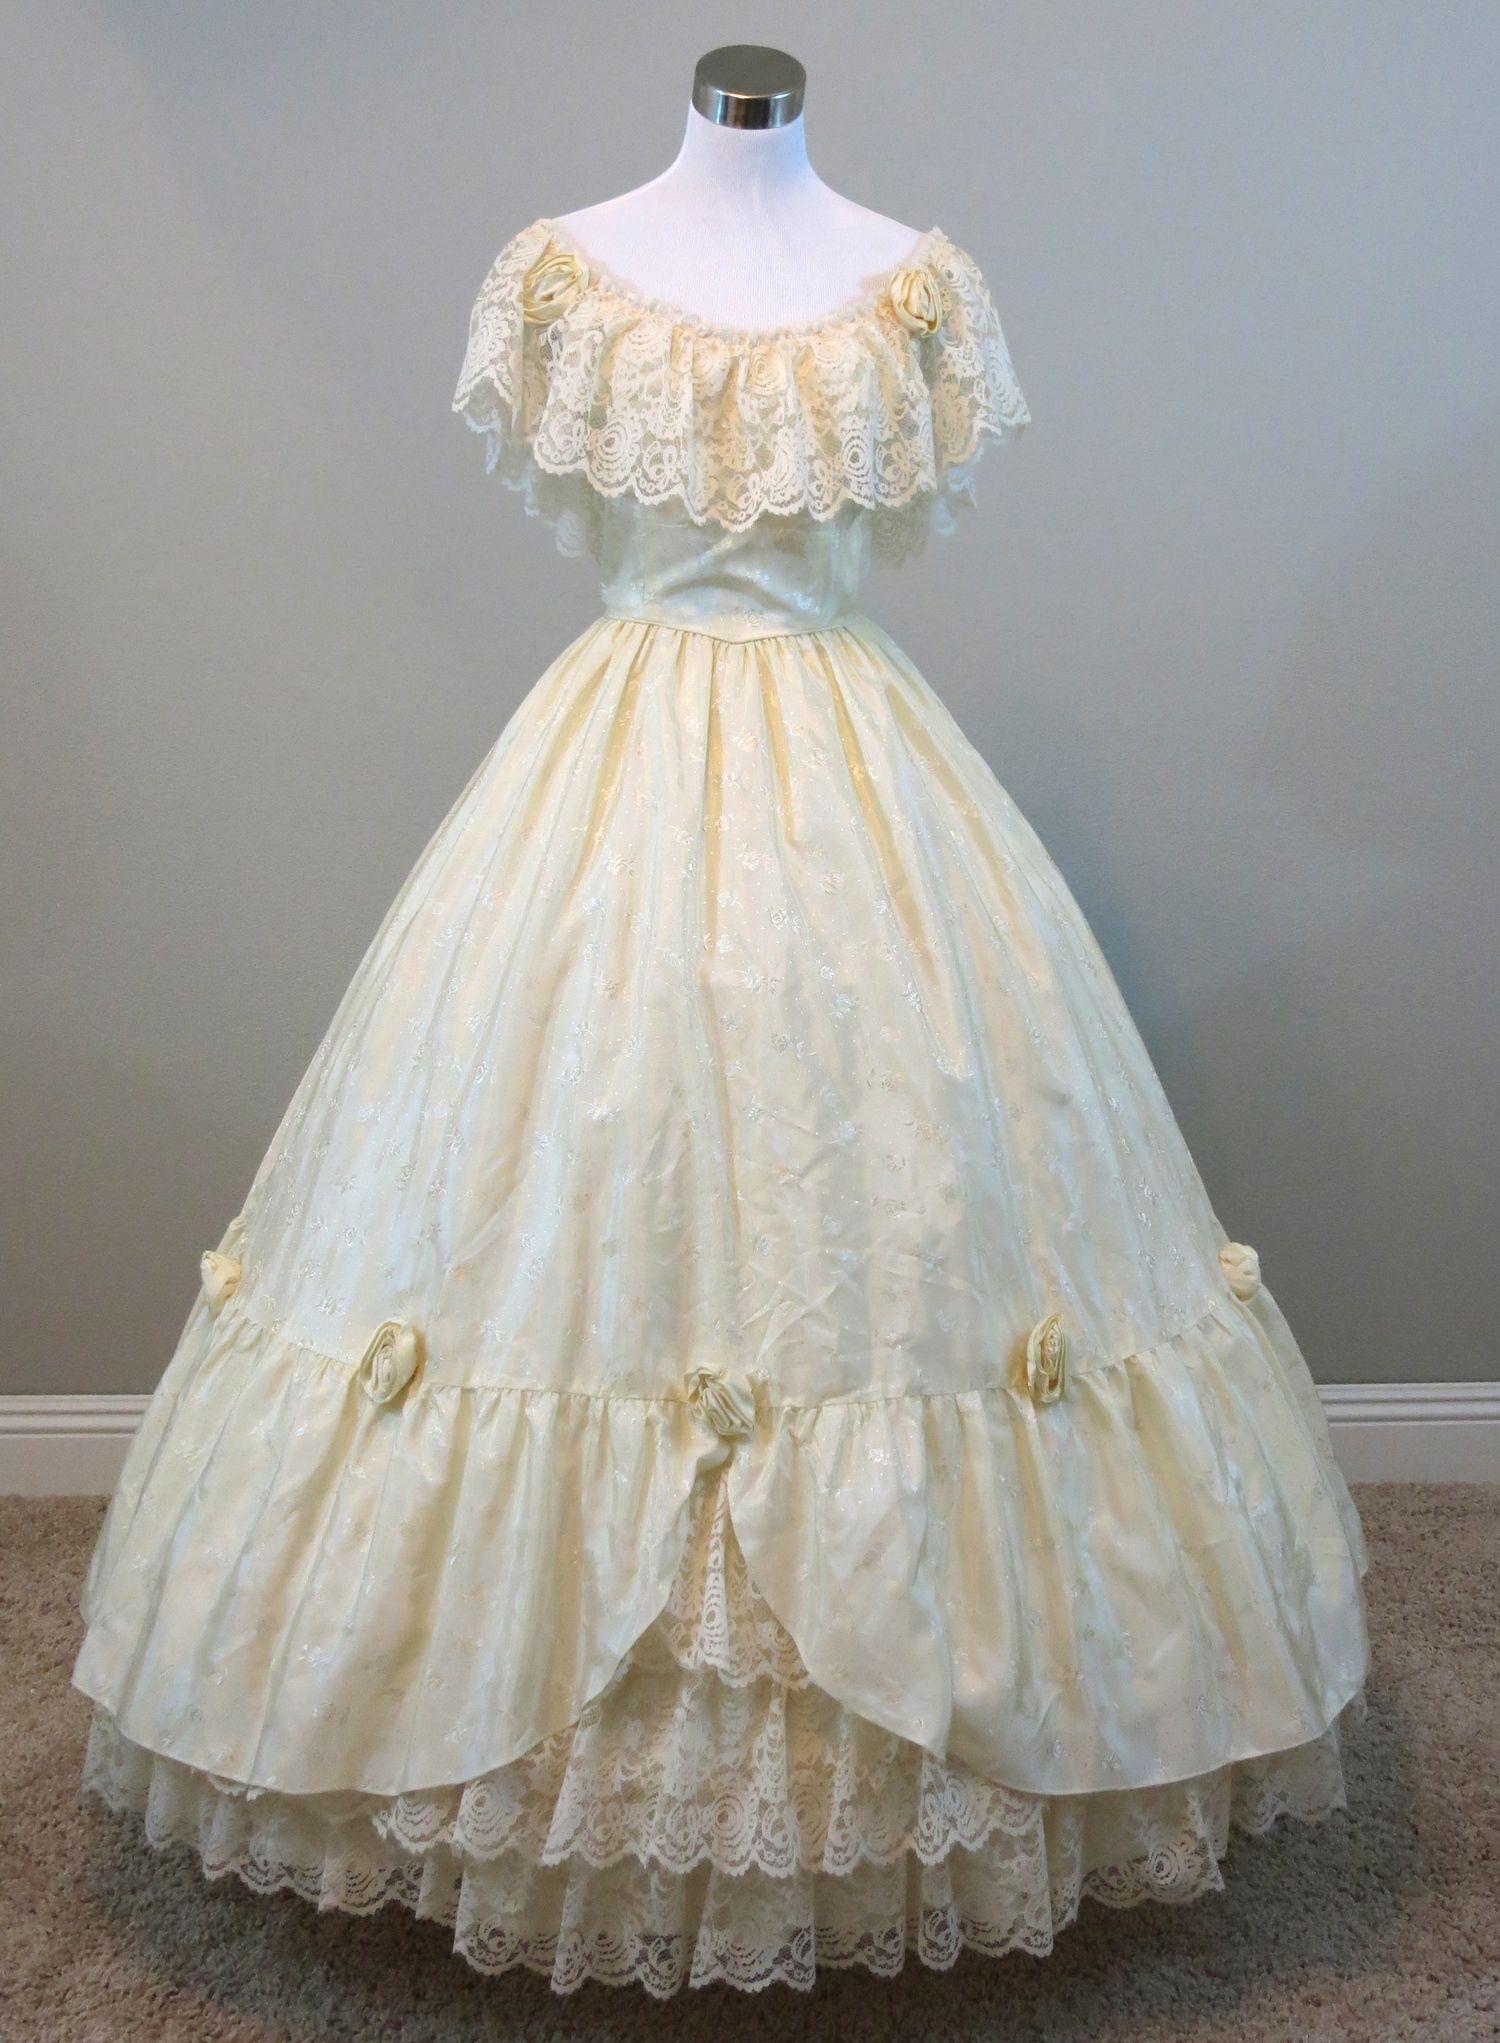 Related image | Civil War Dresses | Pinterest | Belle dress, Civil ...